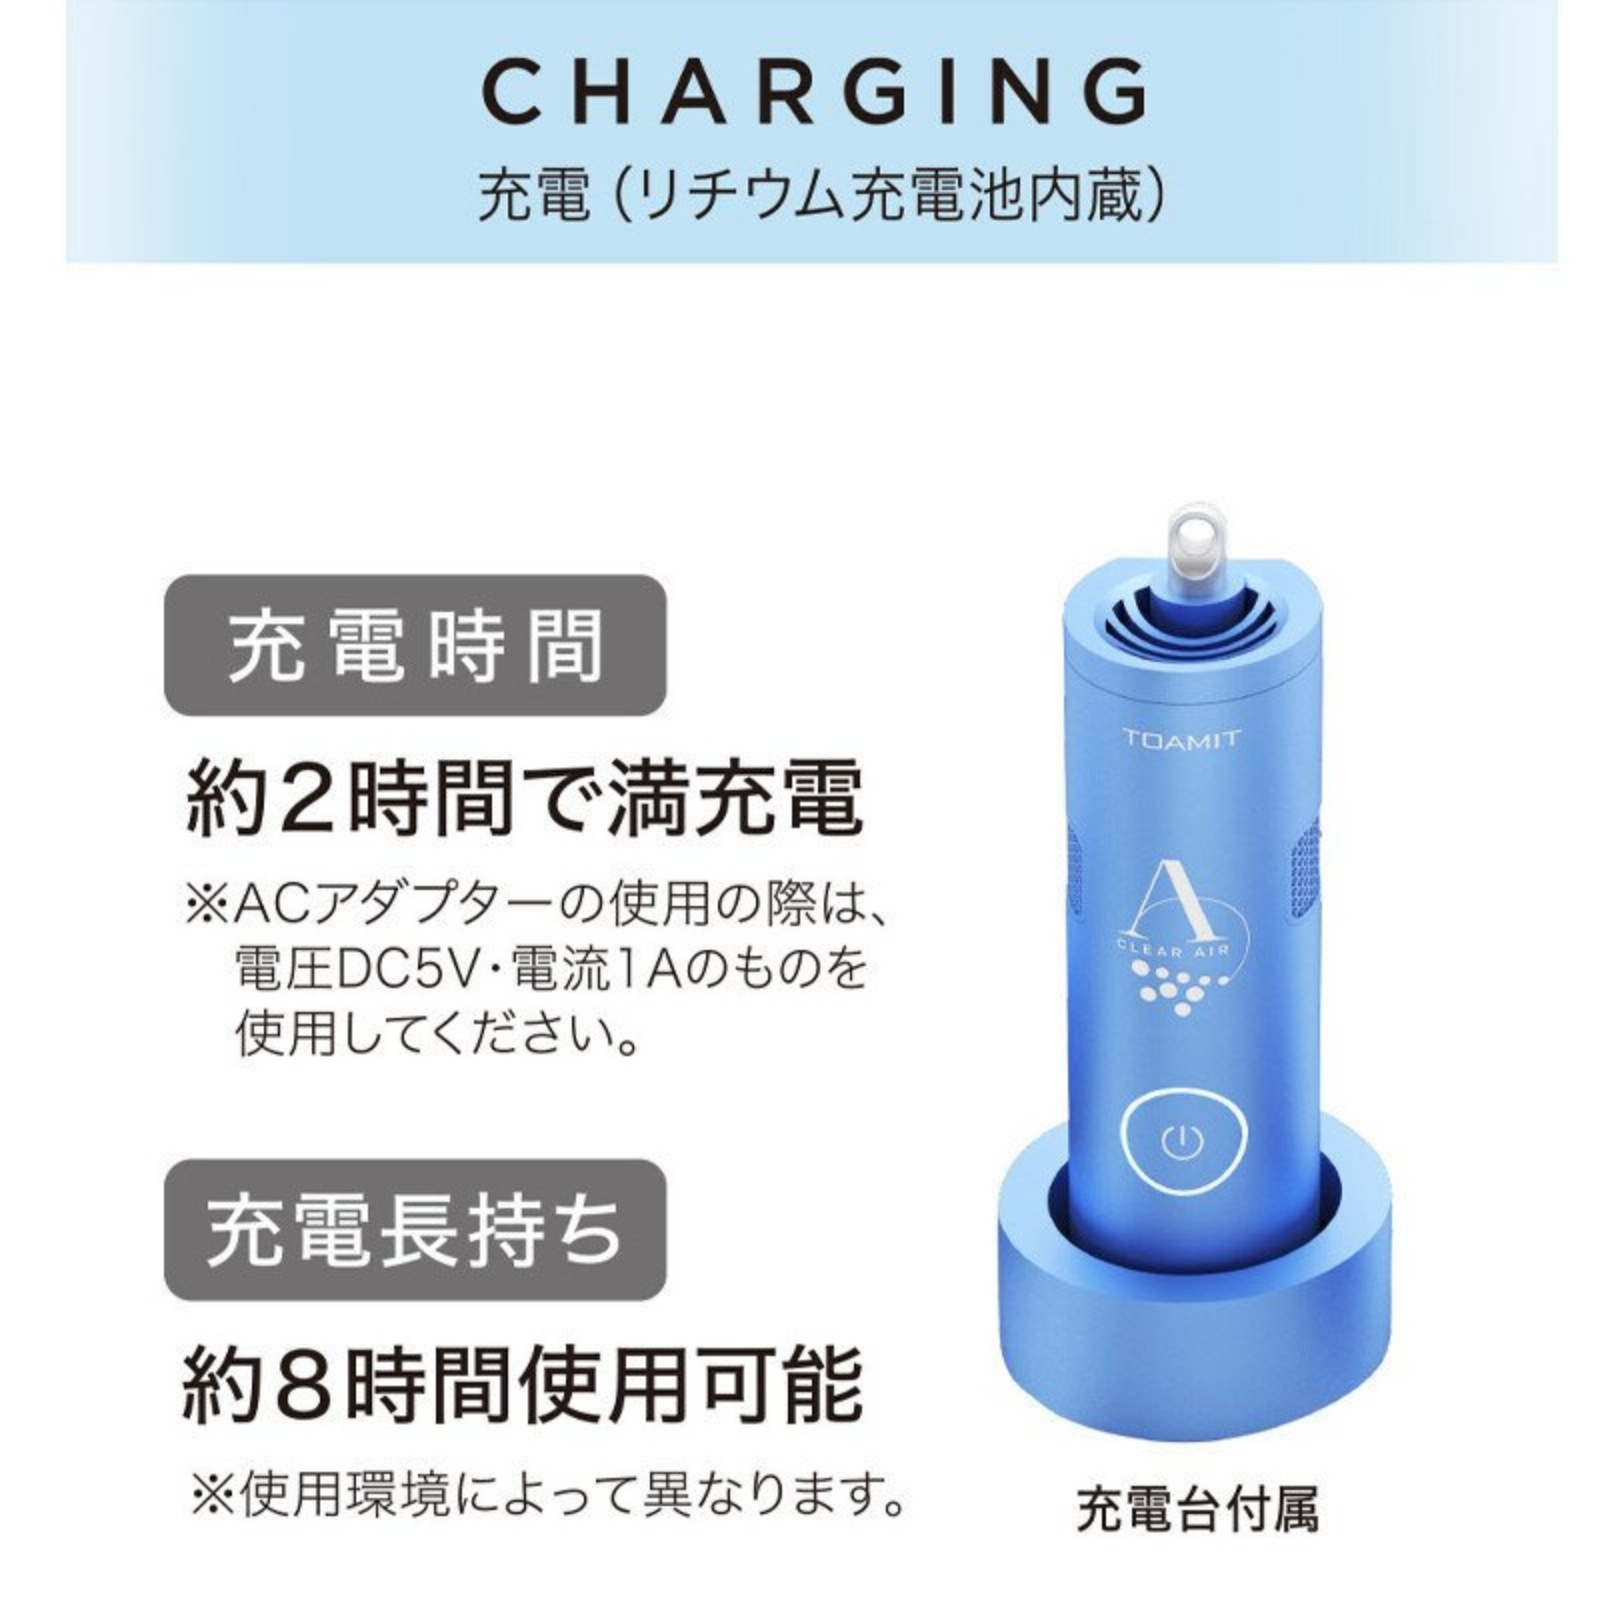 TOAMIT 東亜産業 クリアエアー  ブルー 空気清浄機 首掛けタイプ 除菌&脱臭 光触媒機能搭載 充電式 保証付 TOA-CA-BLU